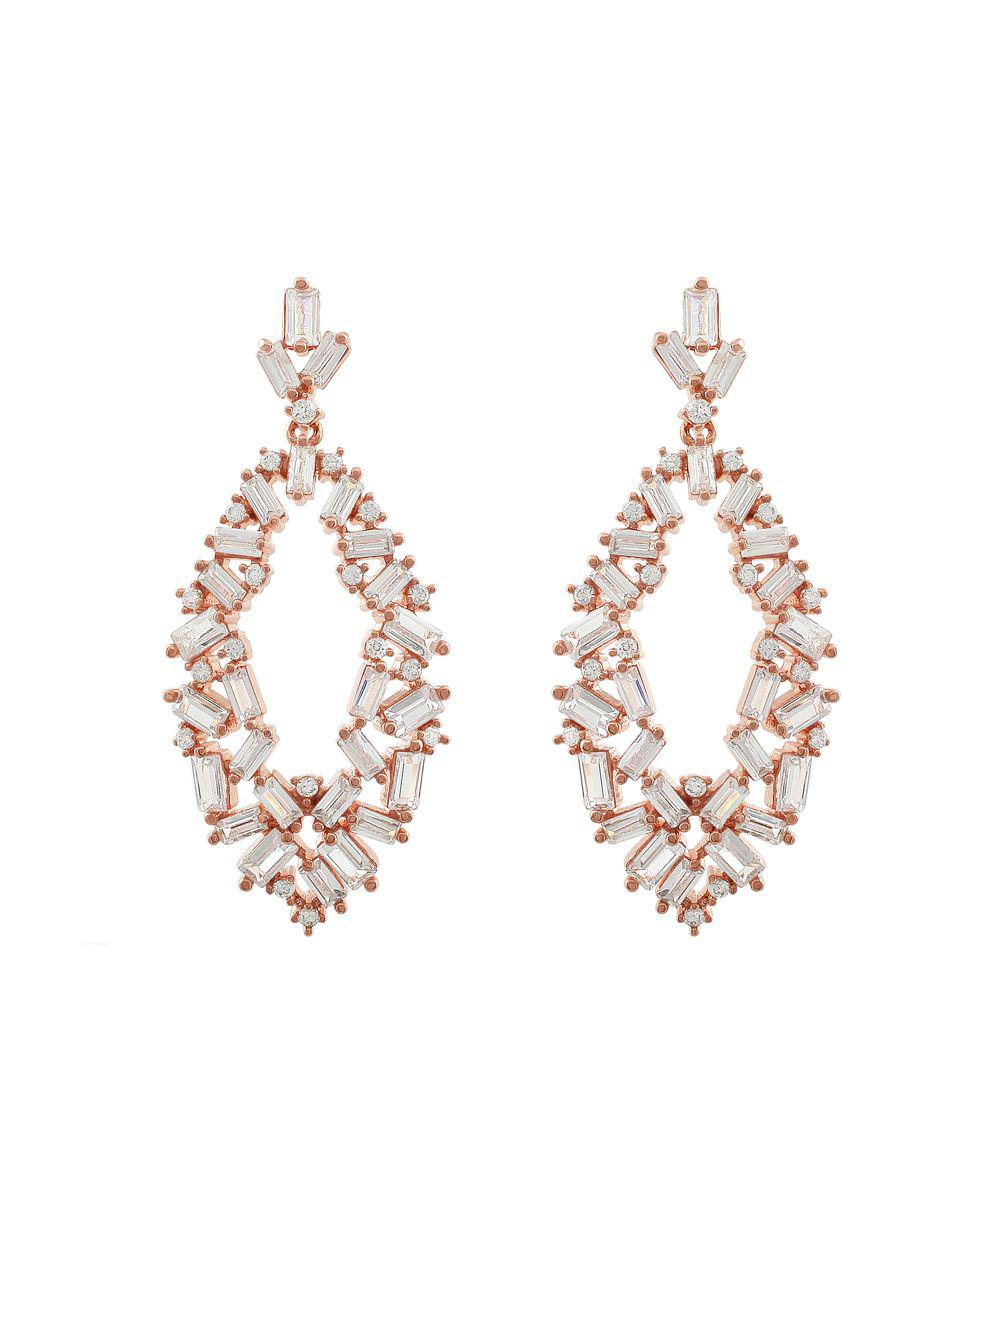 Lyst - Saks Fifth Avenue Jankuo Jewelry Crystal Drop ...